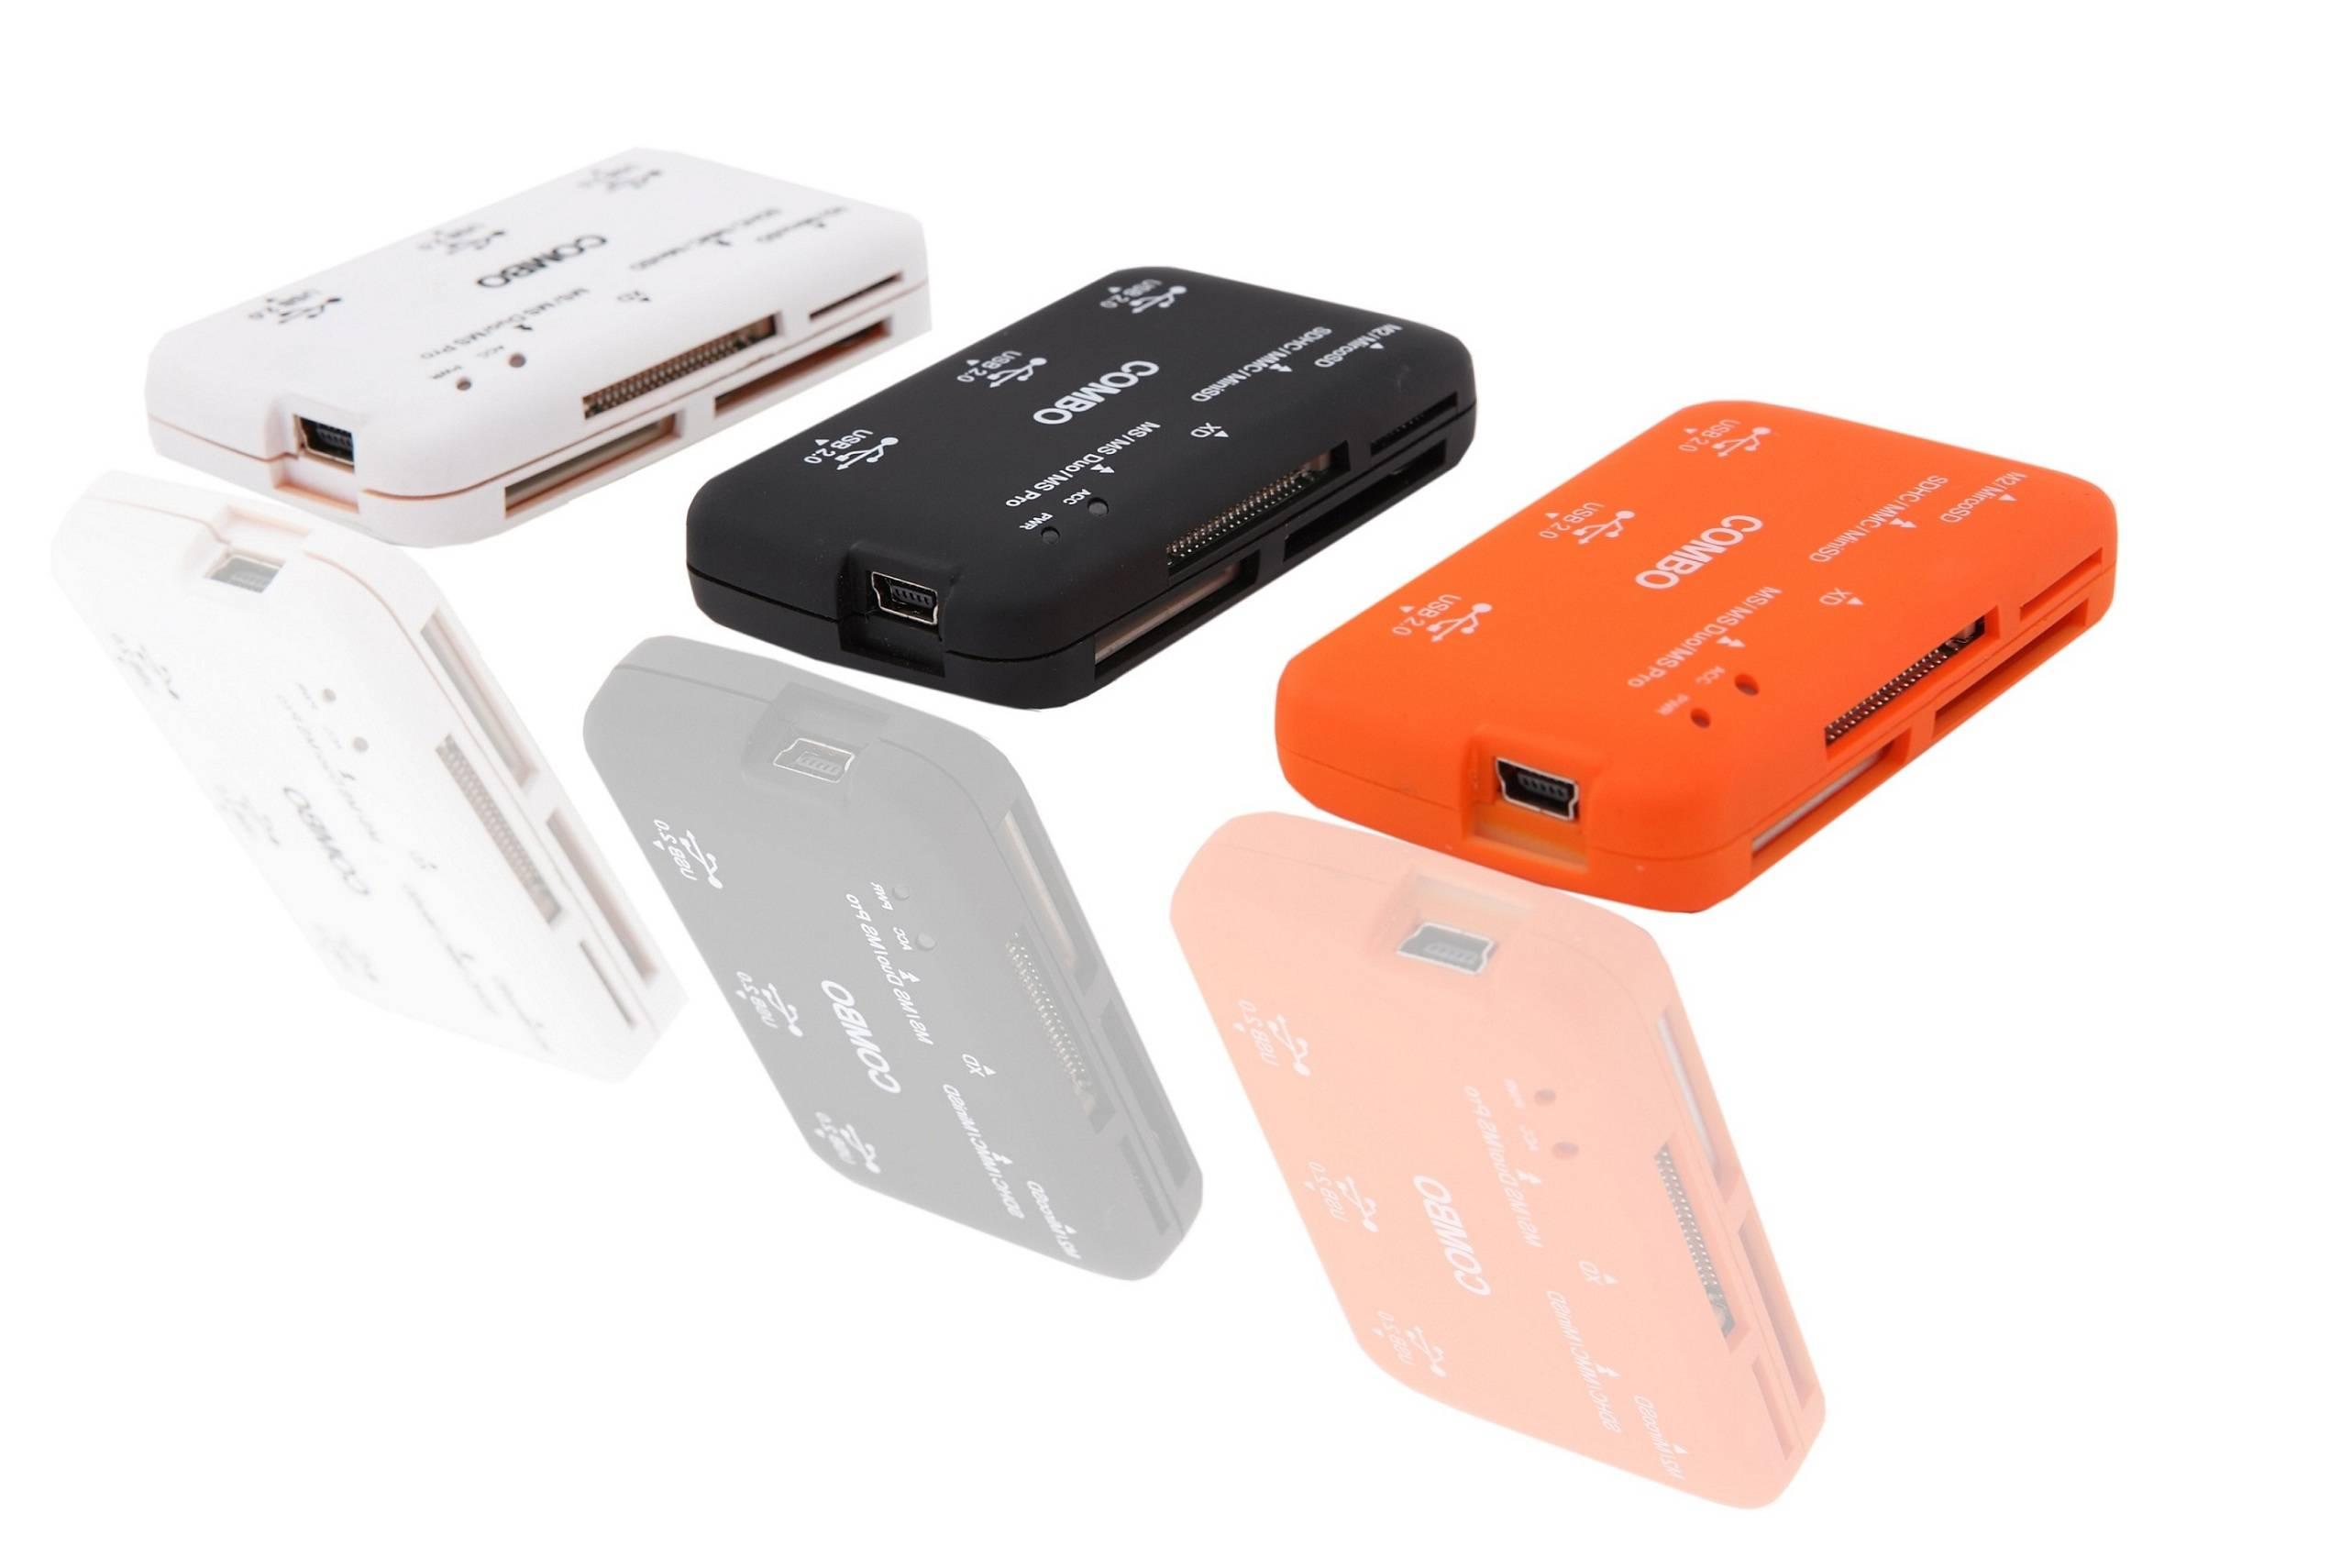 Wholesale USB Hub and Card Reader